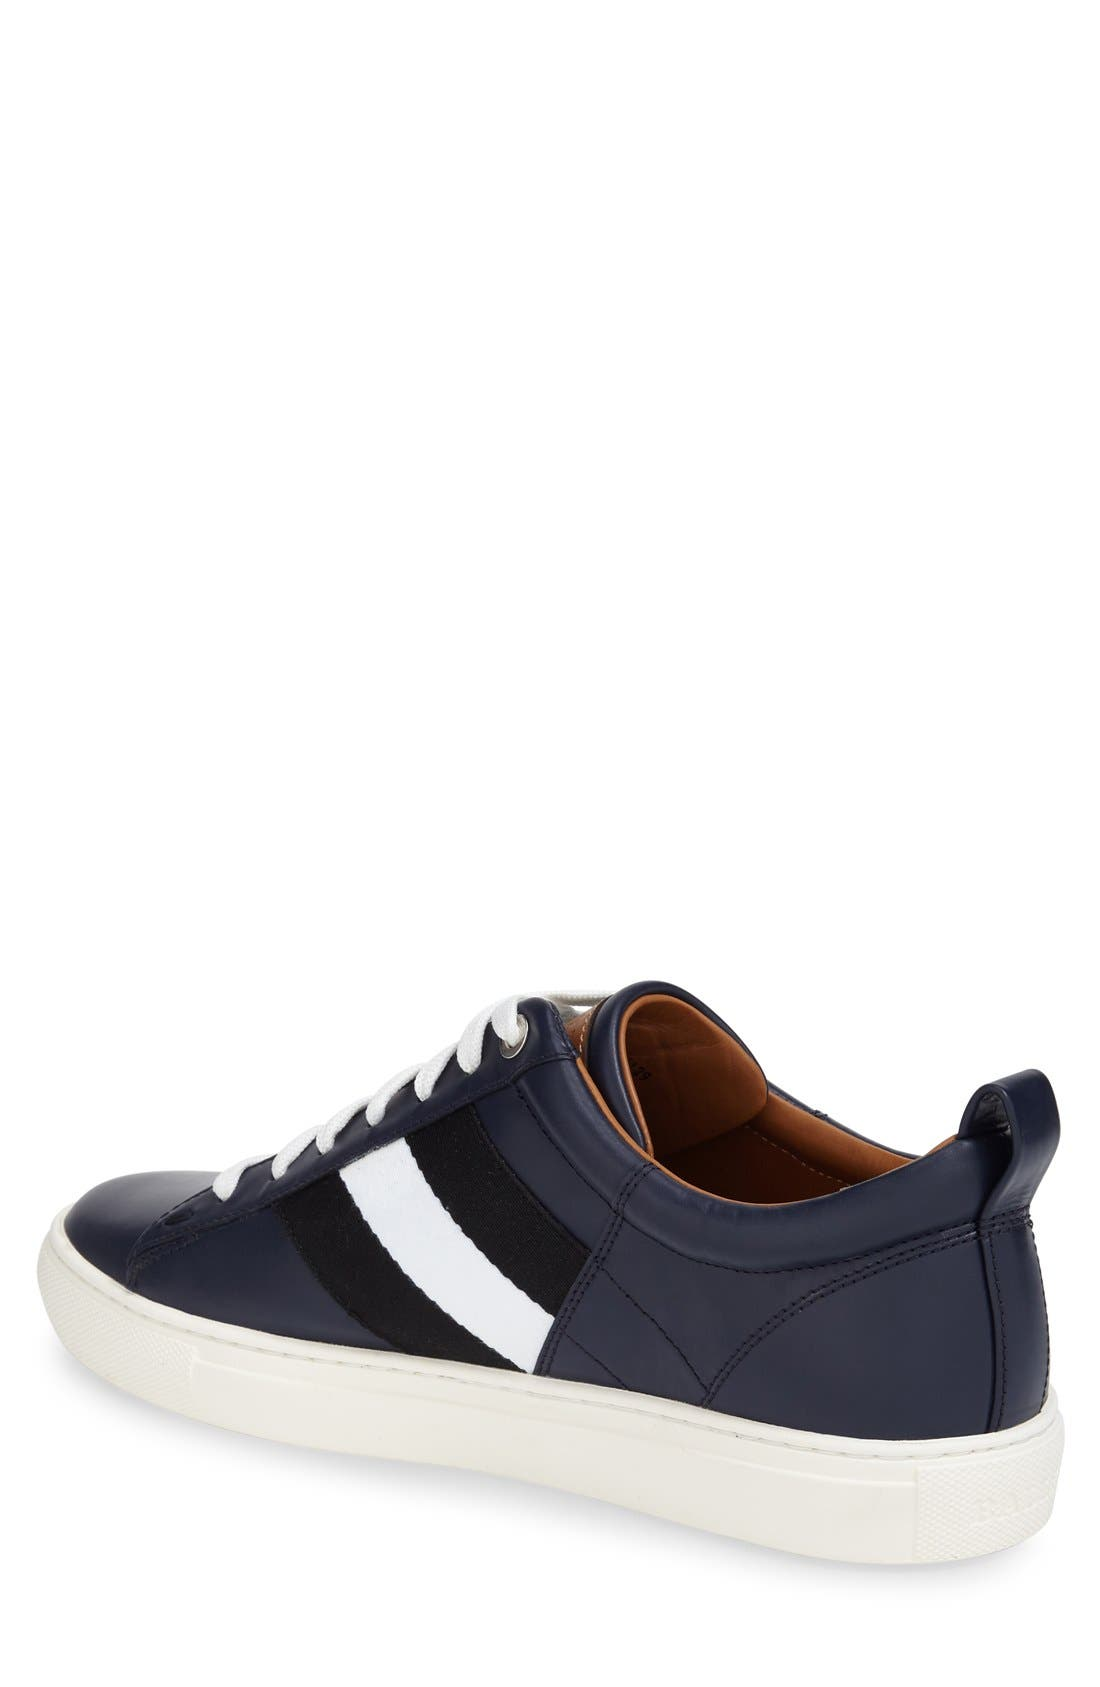 'Helvio' Sneaker,                             Alternate thumbnail 5, color,